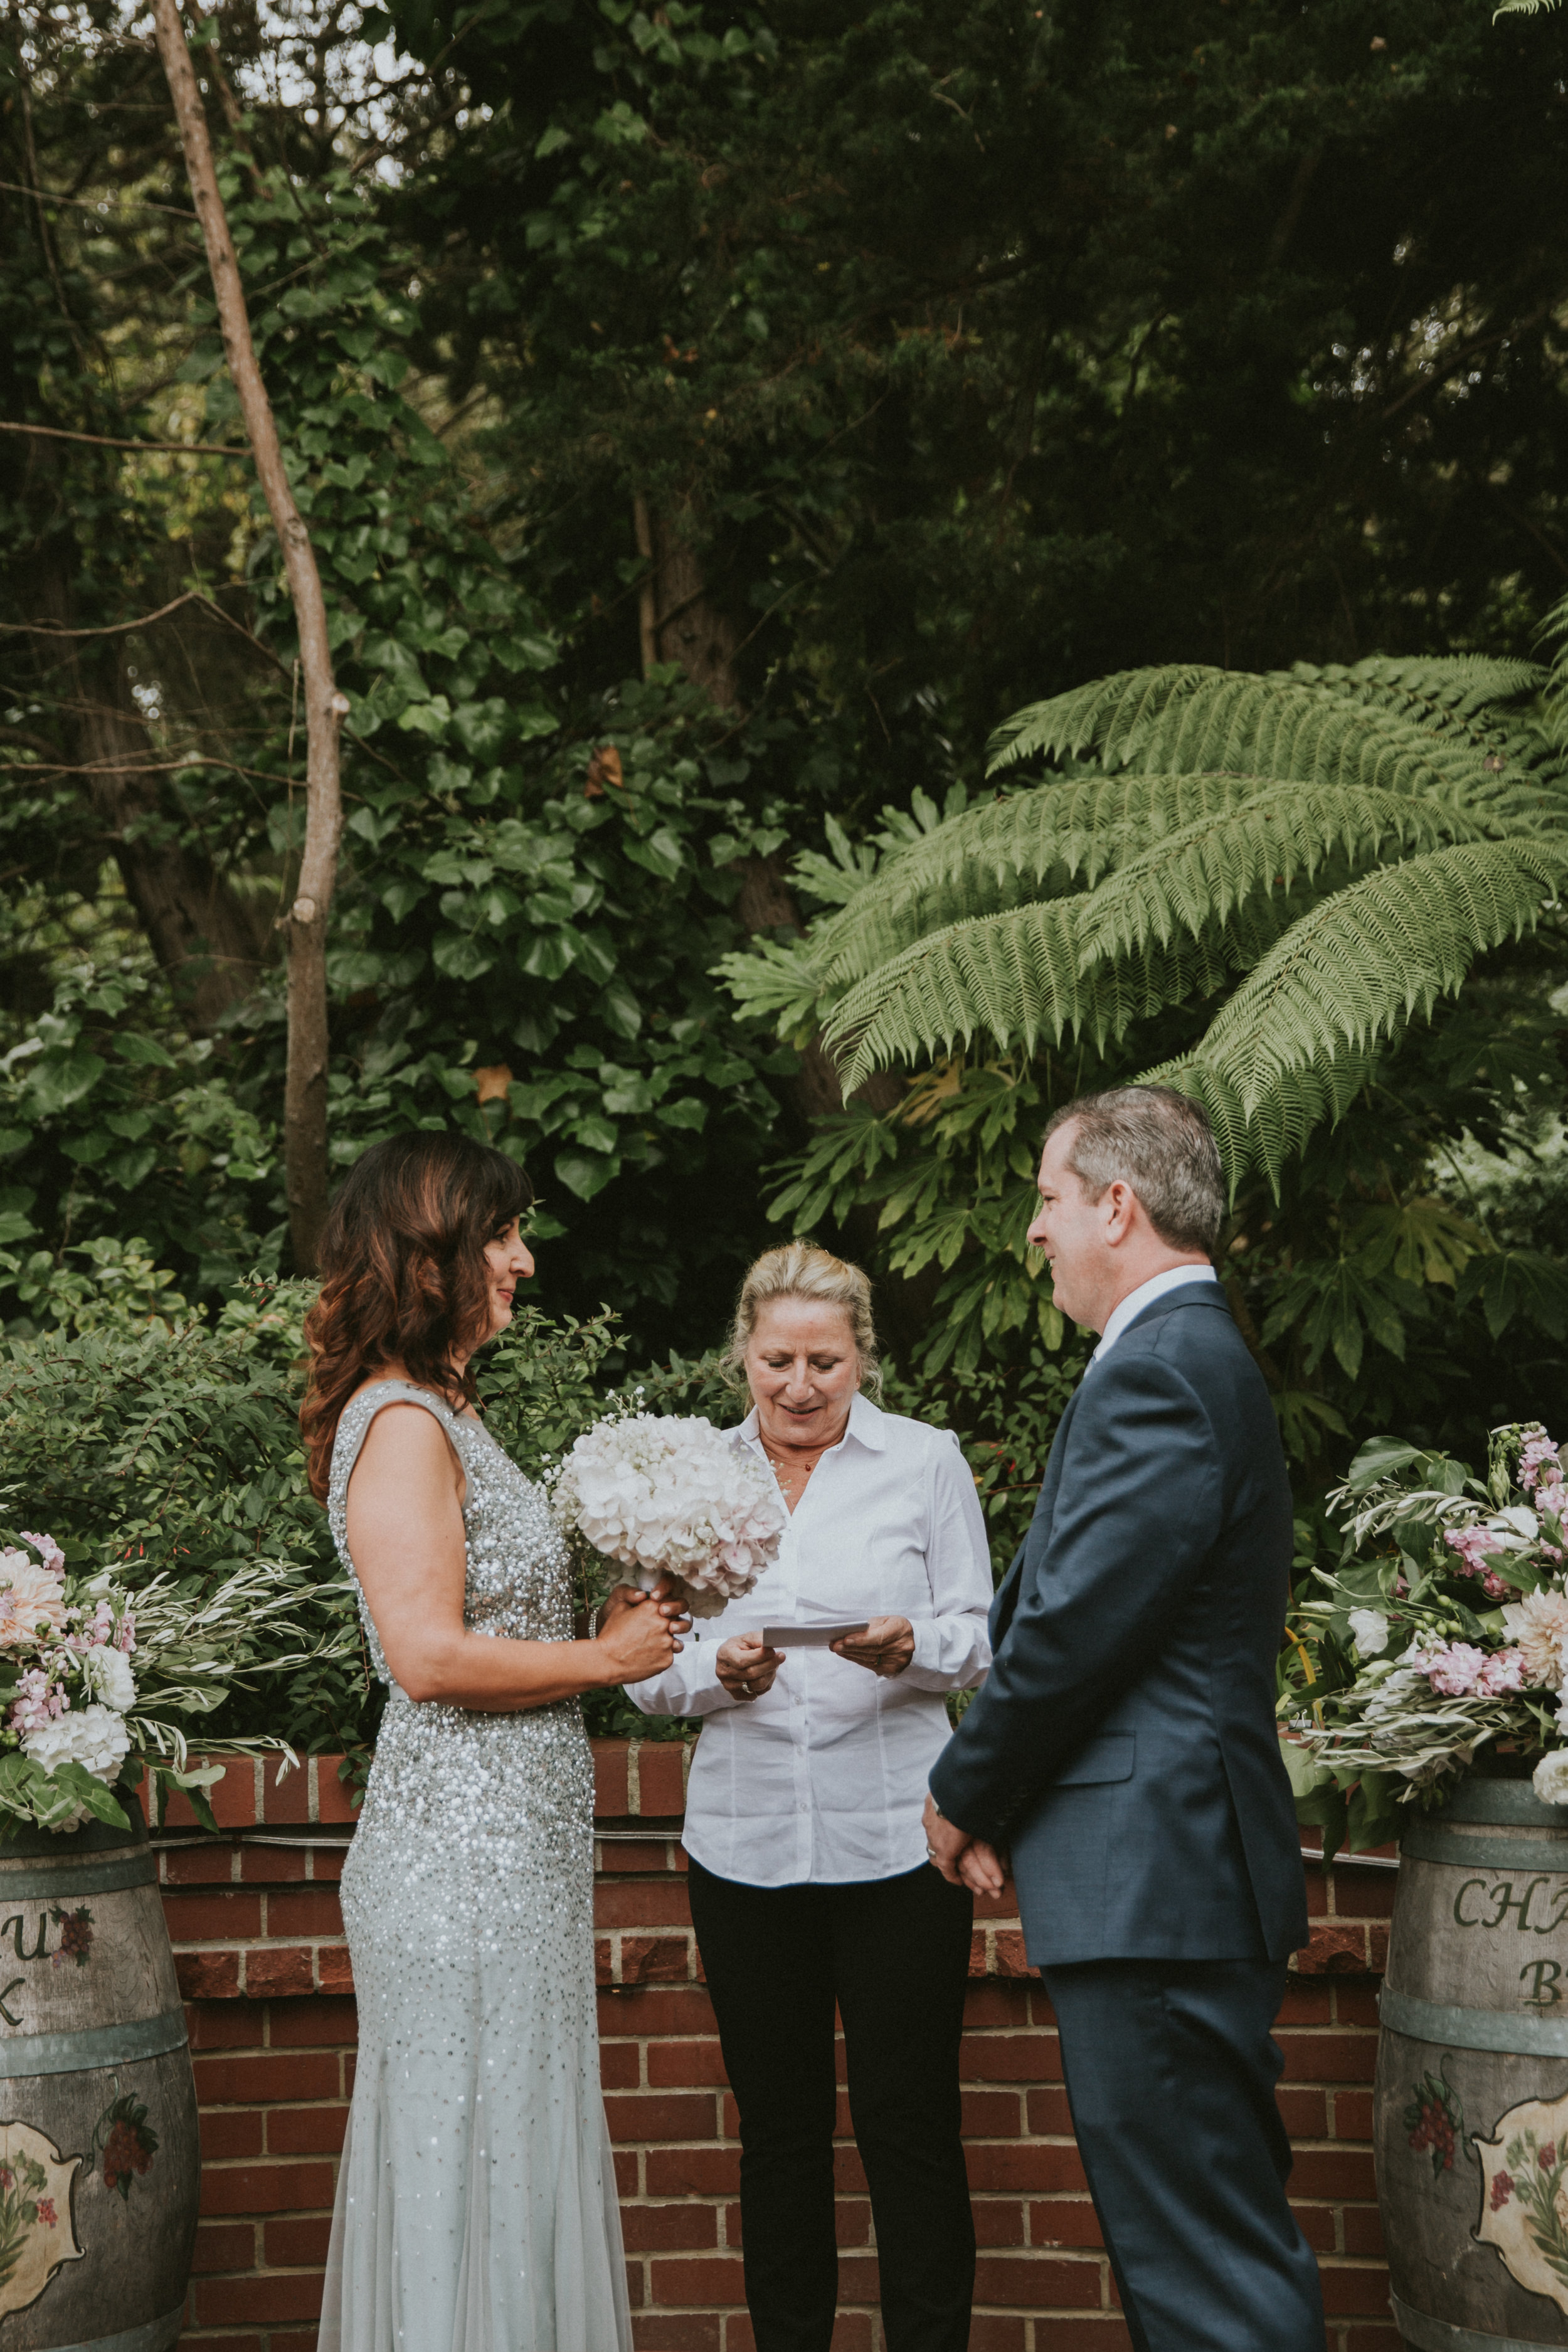 Capitola-Santa-Cruz-wedding-photographer-201.jpg